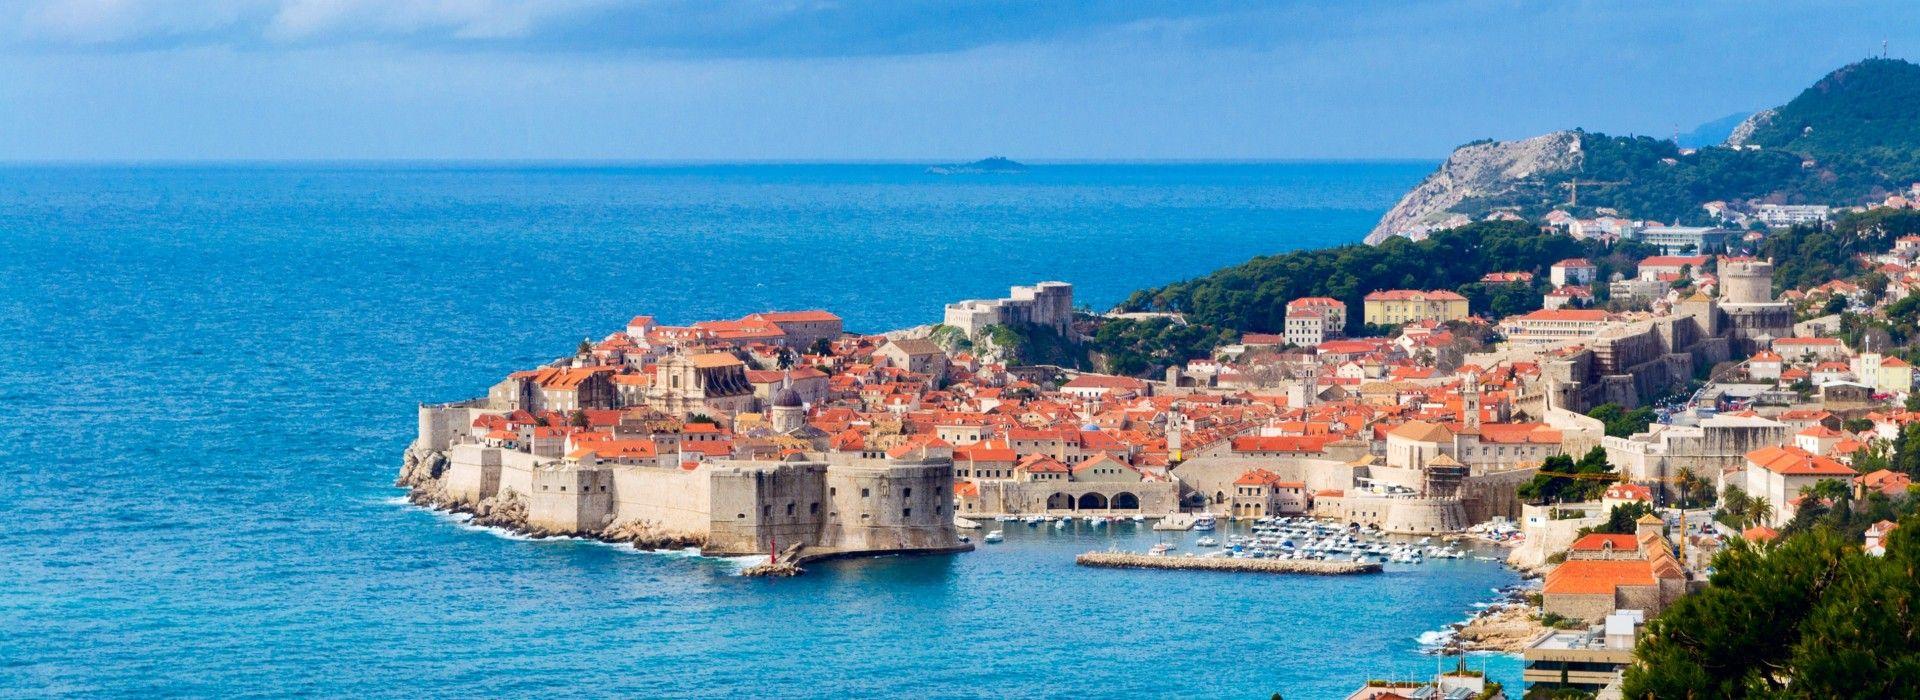 Local boat rides Tours in Croatia